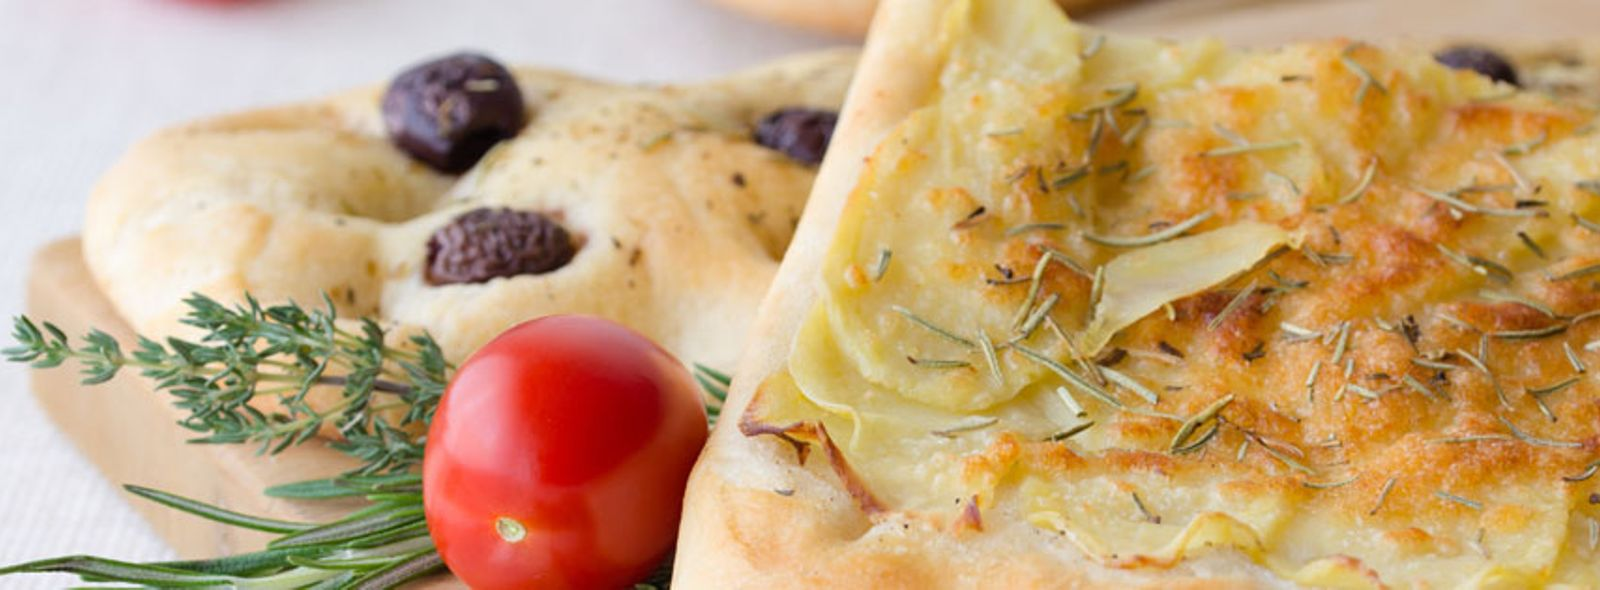 Street food a Bari: mangiare bene con 5 euro